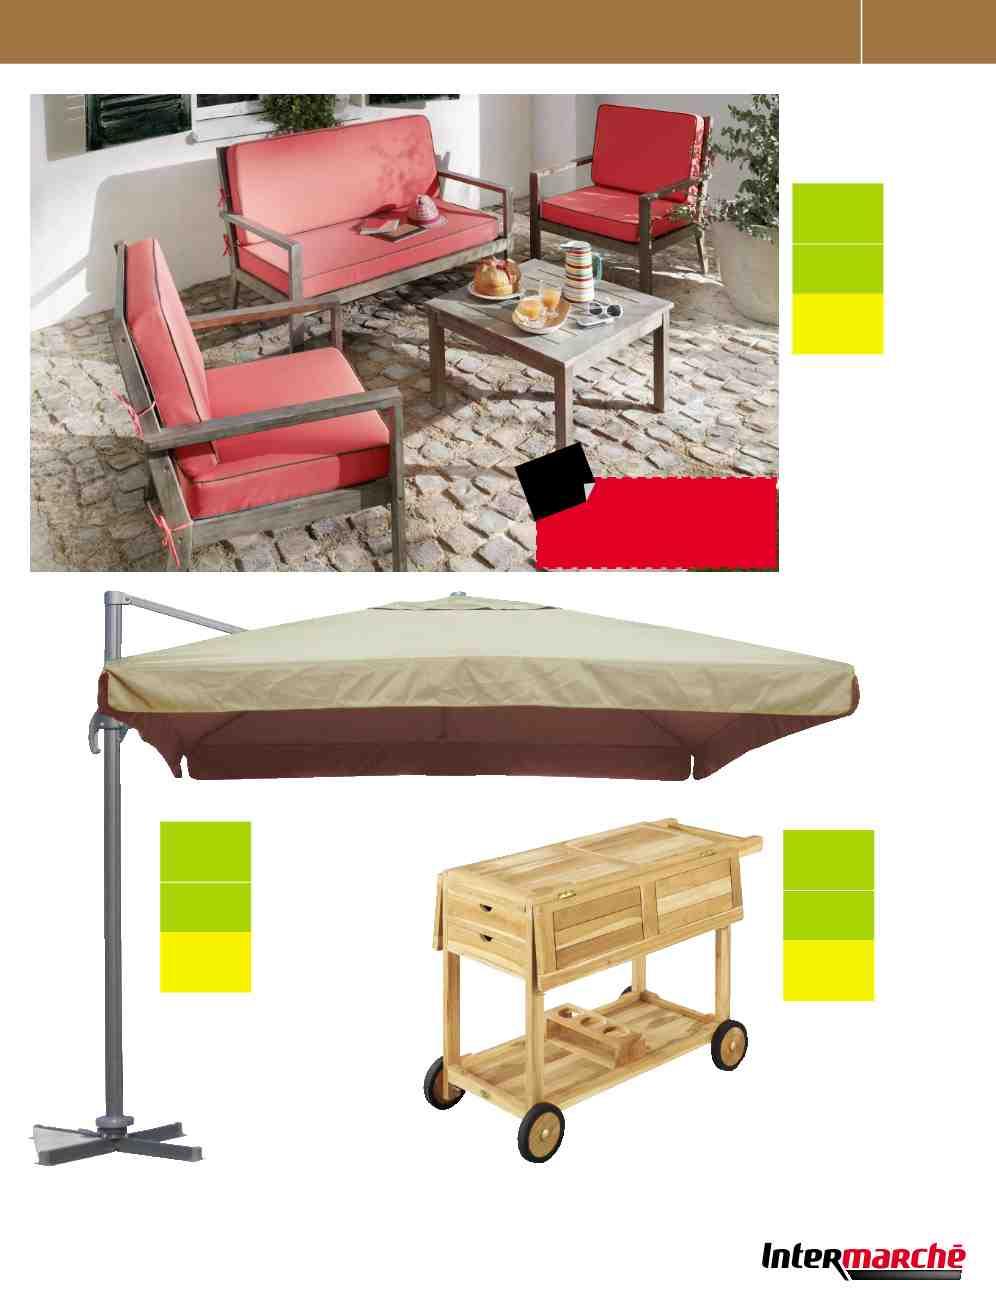 Meubles Jardin Barbecue Piscine Intermarche Catalogue 25 ... pour Intermarché Table De Jardin